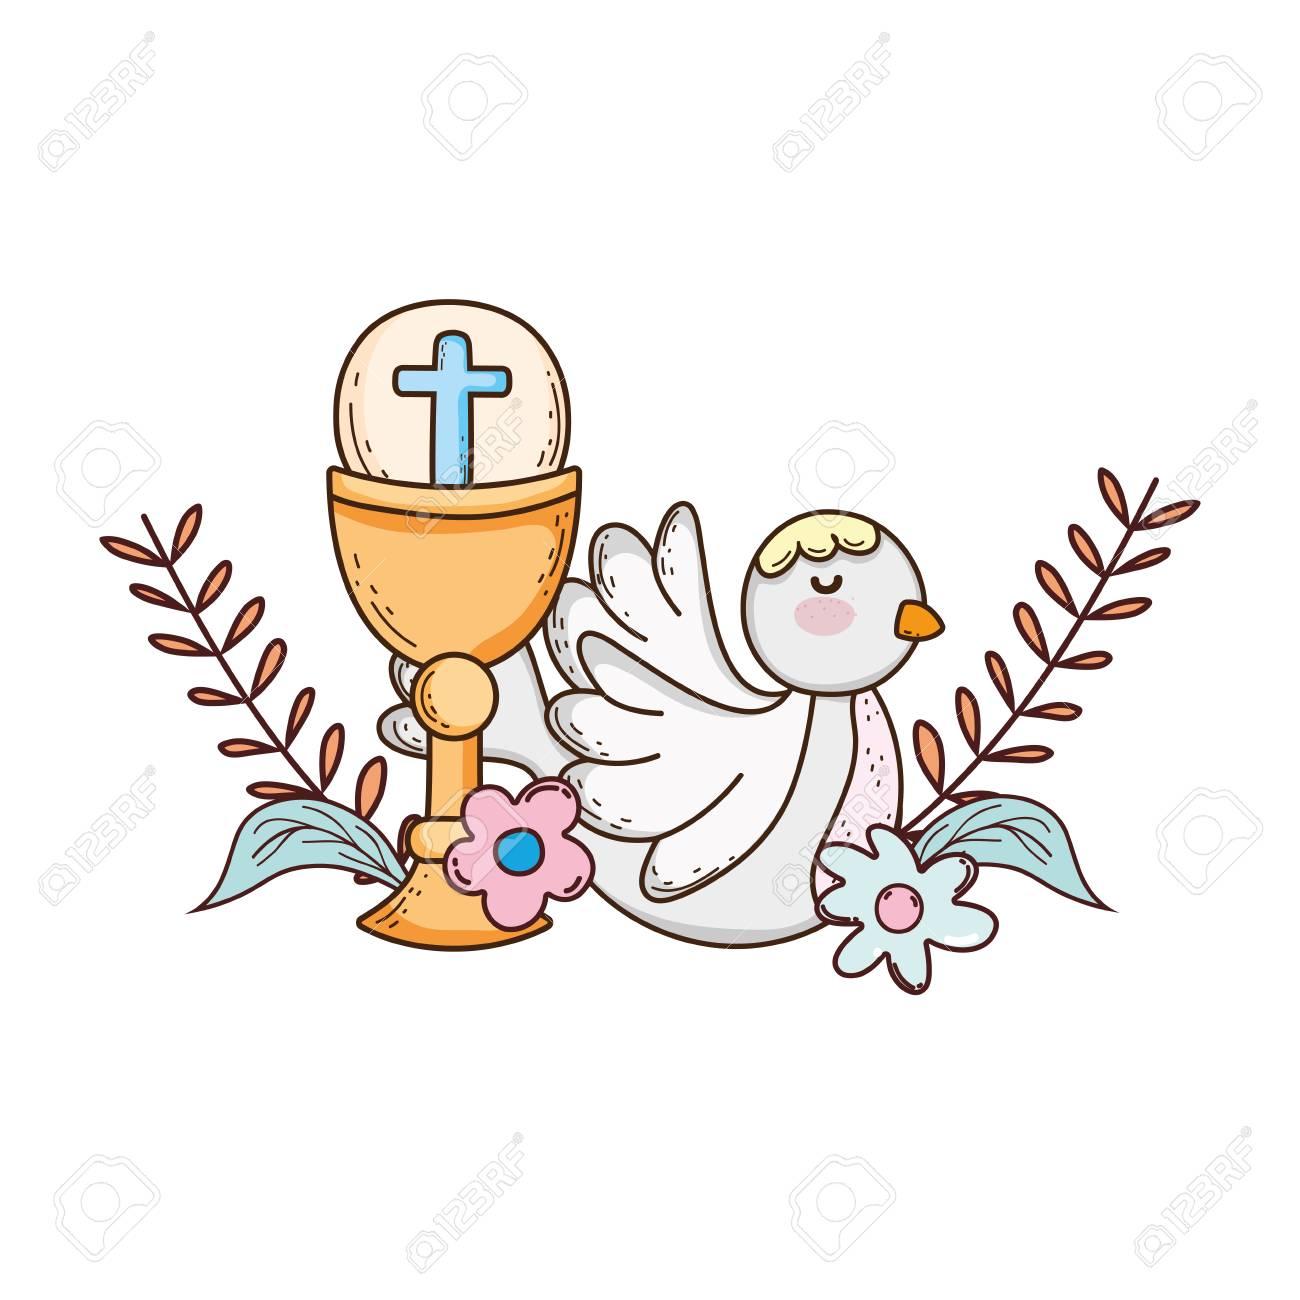 sacred chalice religious with dove bird - 116332670